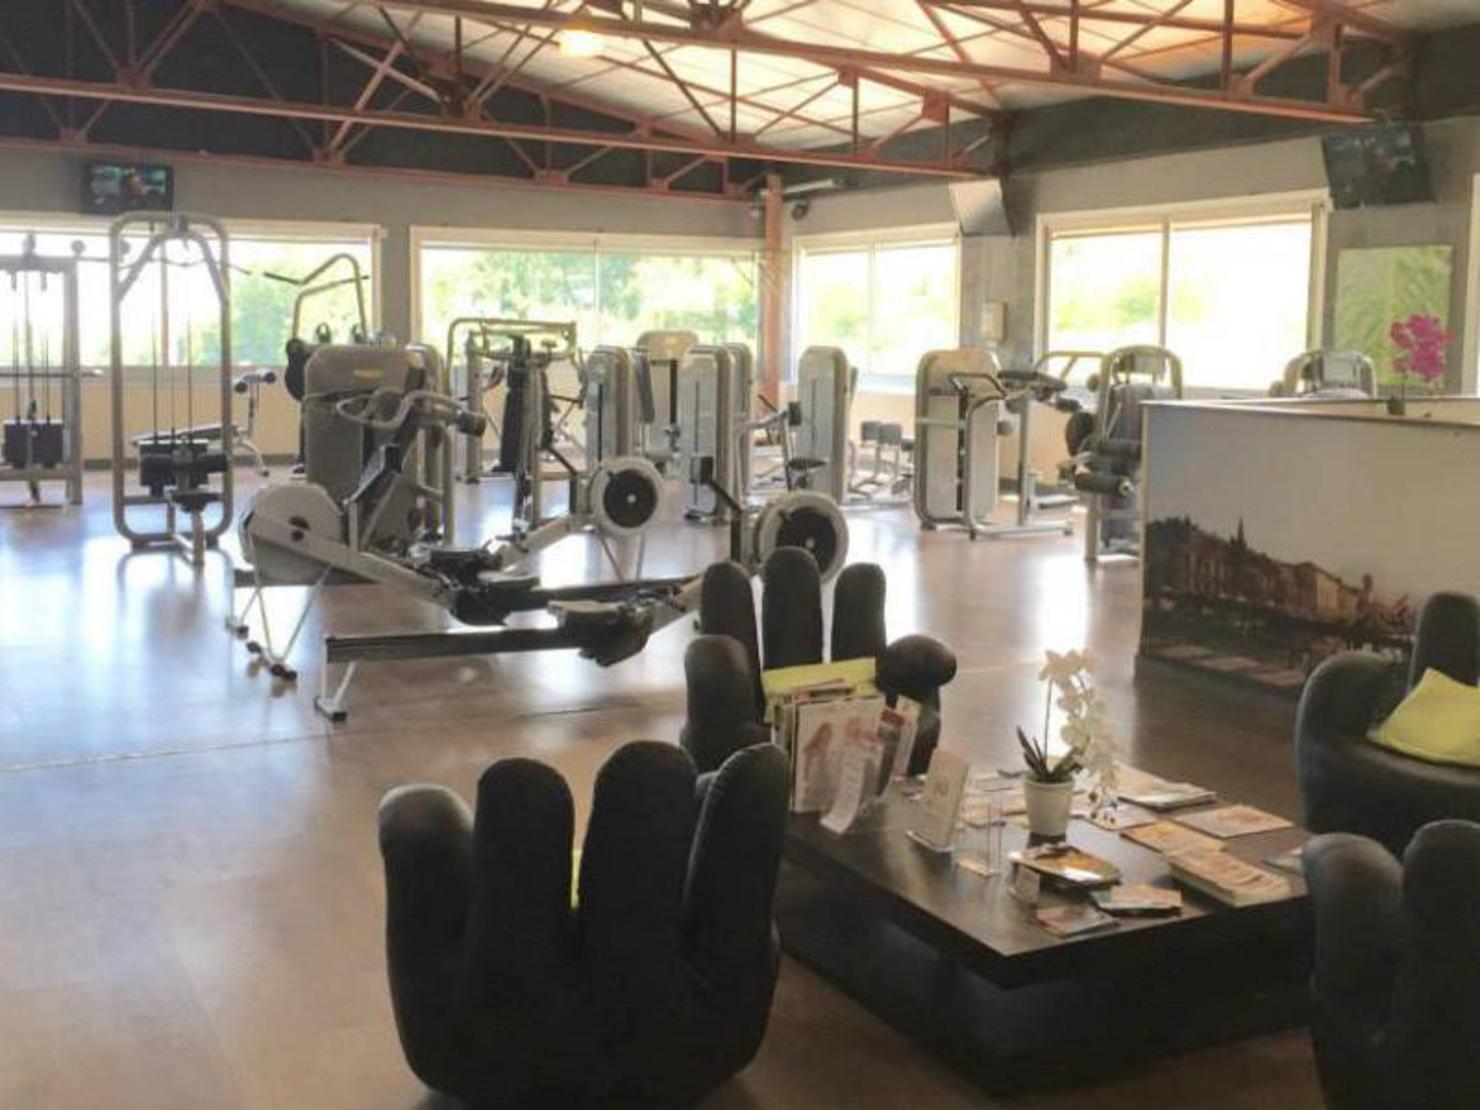 fifty nine fitness club voiron tarifs avis horaires essai gratuit. Black Bedroom Furniture Sets. Home Design Ideas